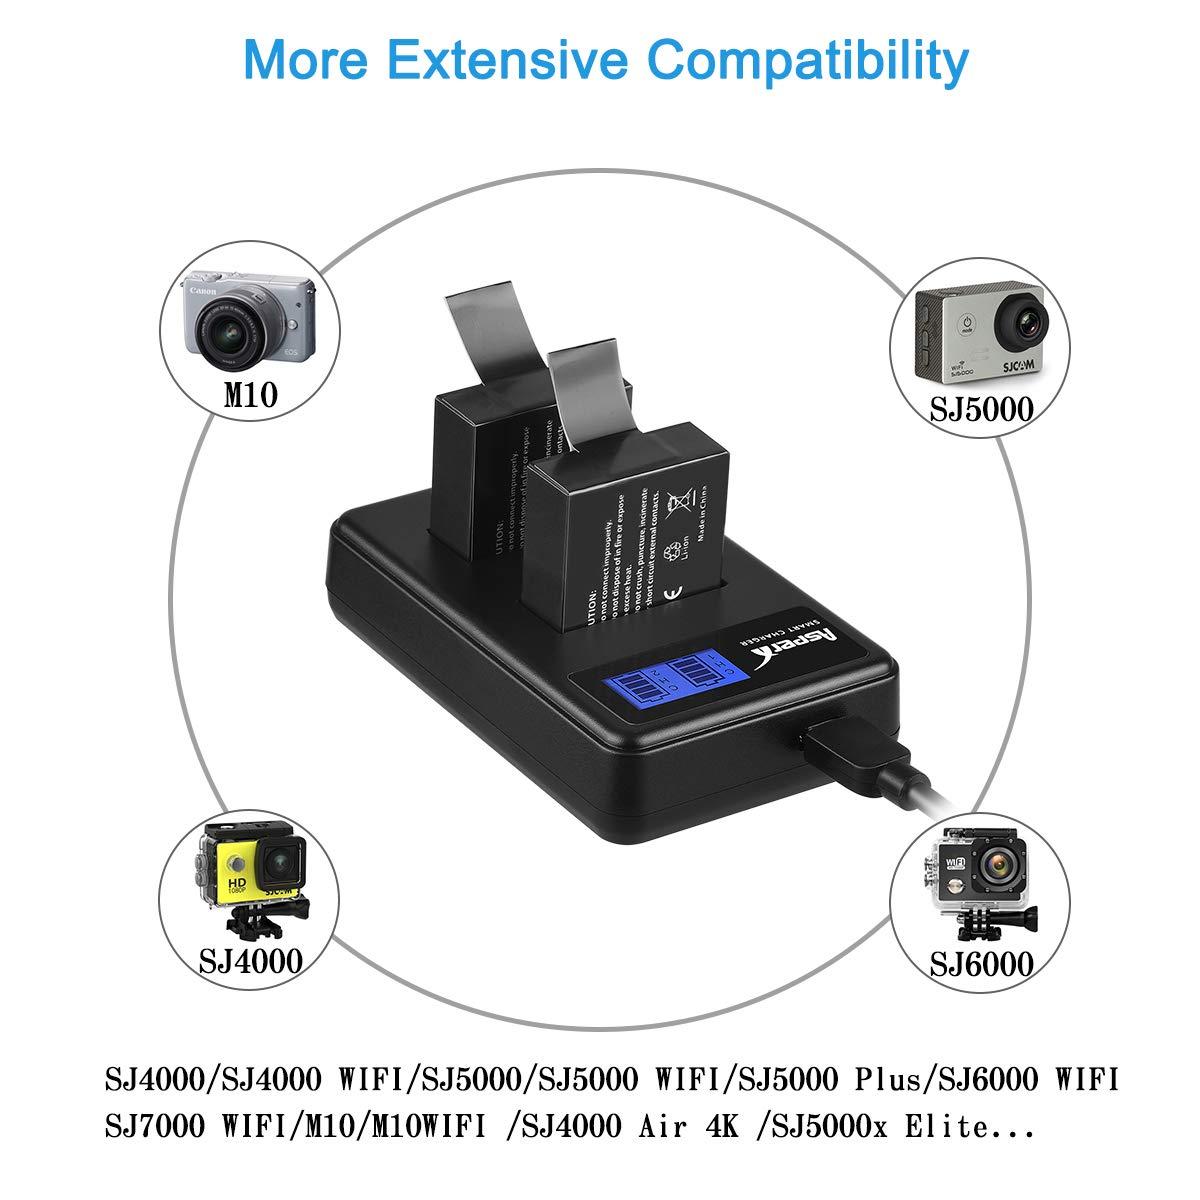 Amazon.com: Juego de baterías.: Camera & Photo